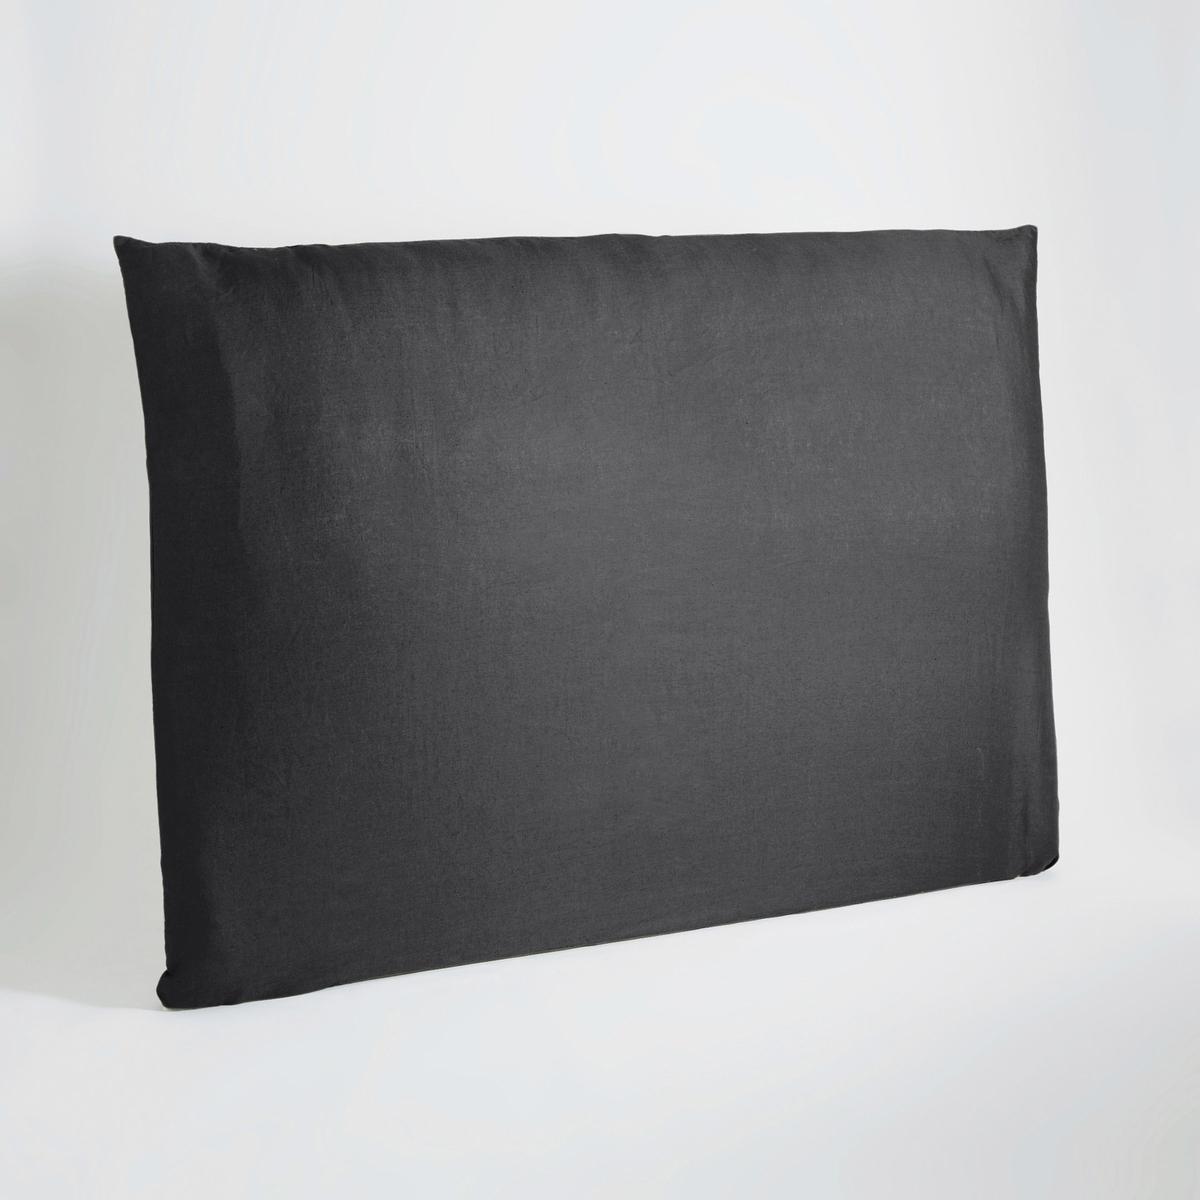 Чехол LaRedoute На изголовье кровати из осветленного льна Mereson 180 см серый чехол laredoute для кровати 100 льна 160 x 200 см белый